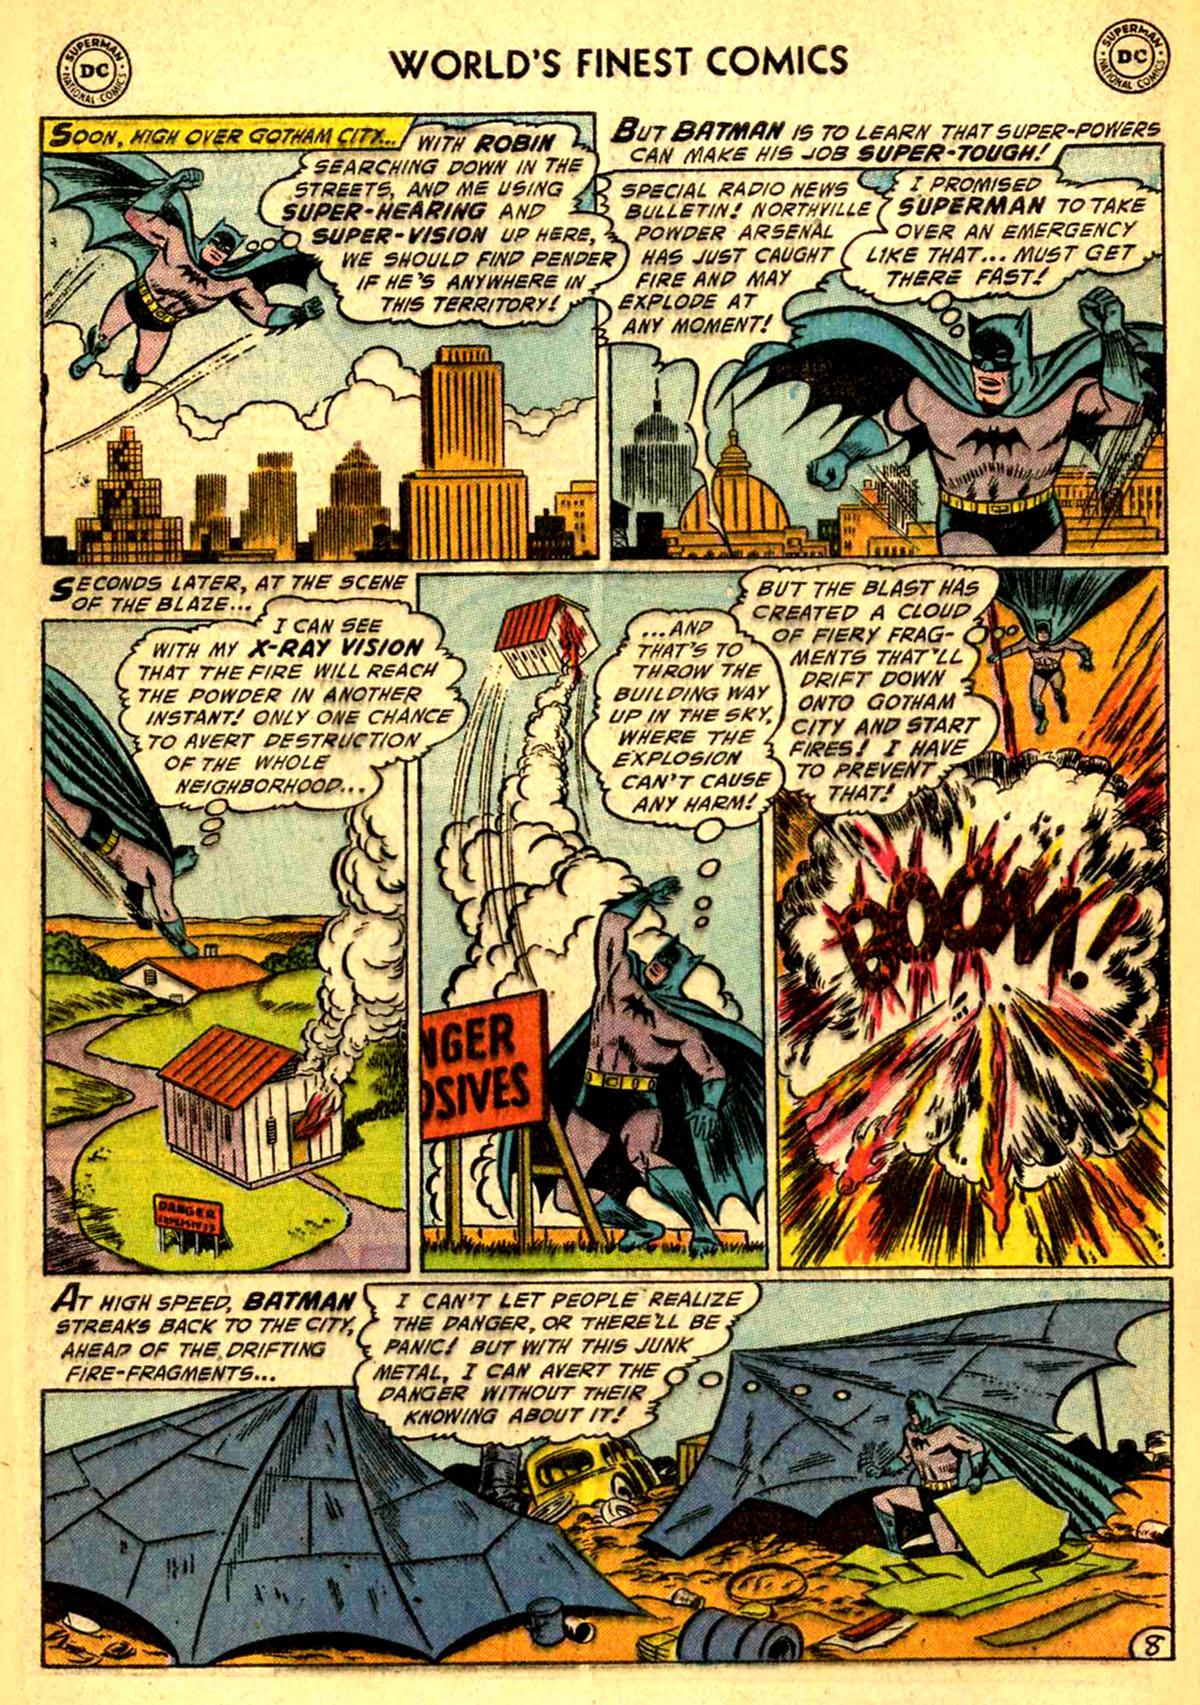 Read online World's Finest Comics comic -  Issue #77 - 10